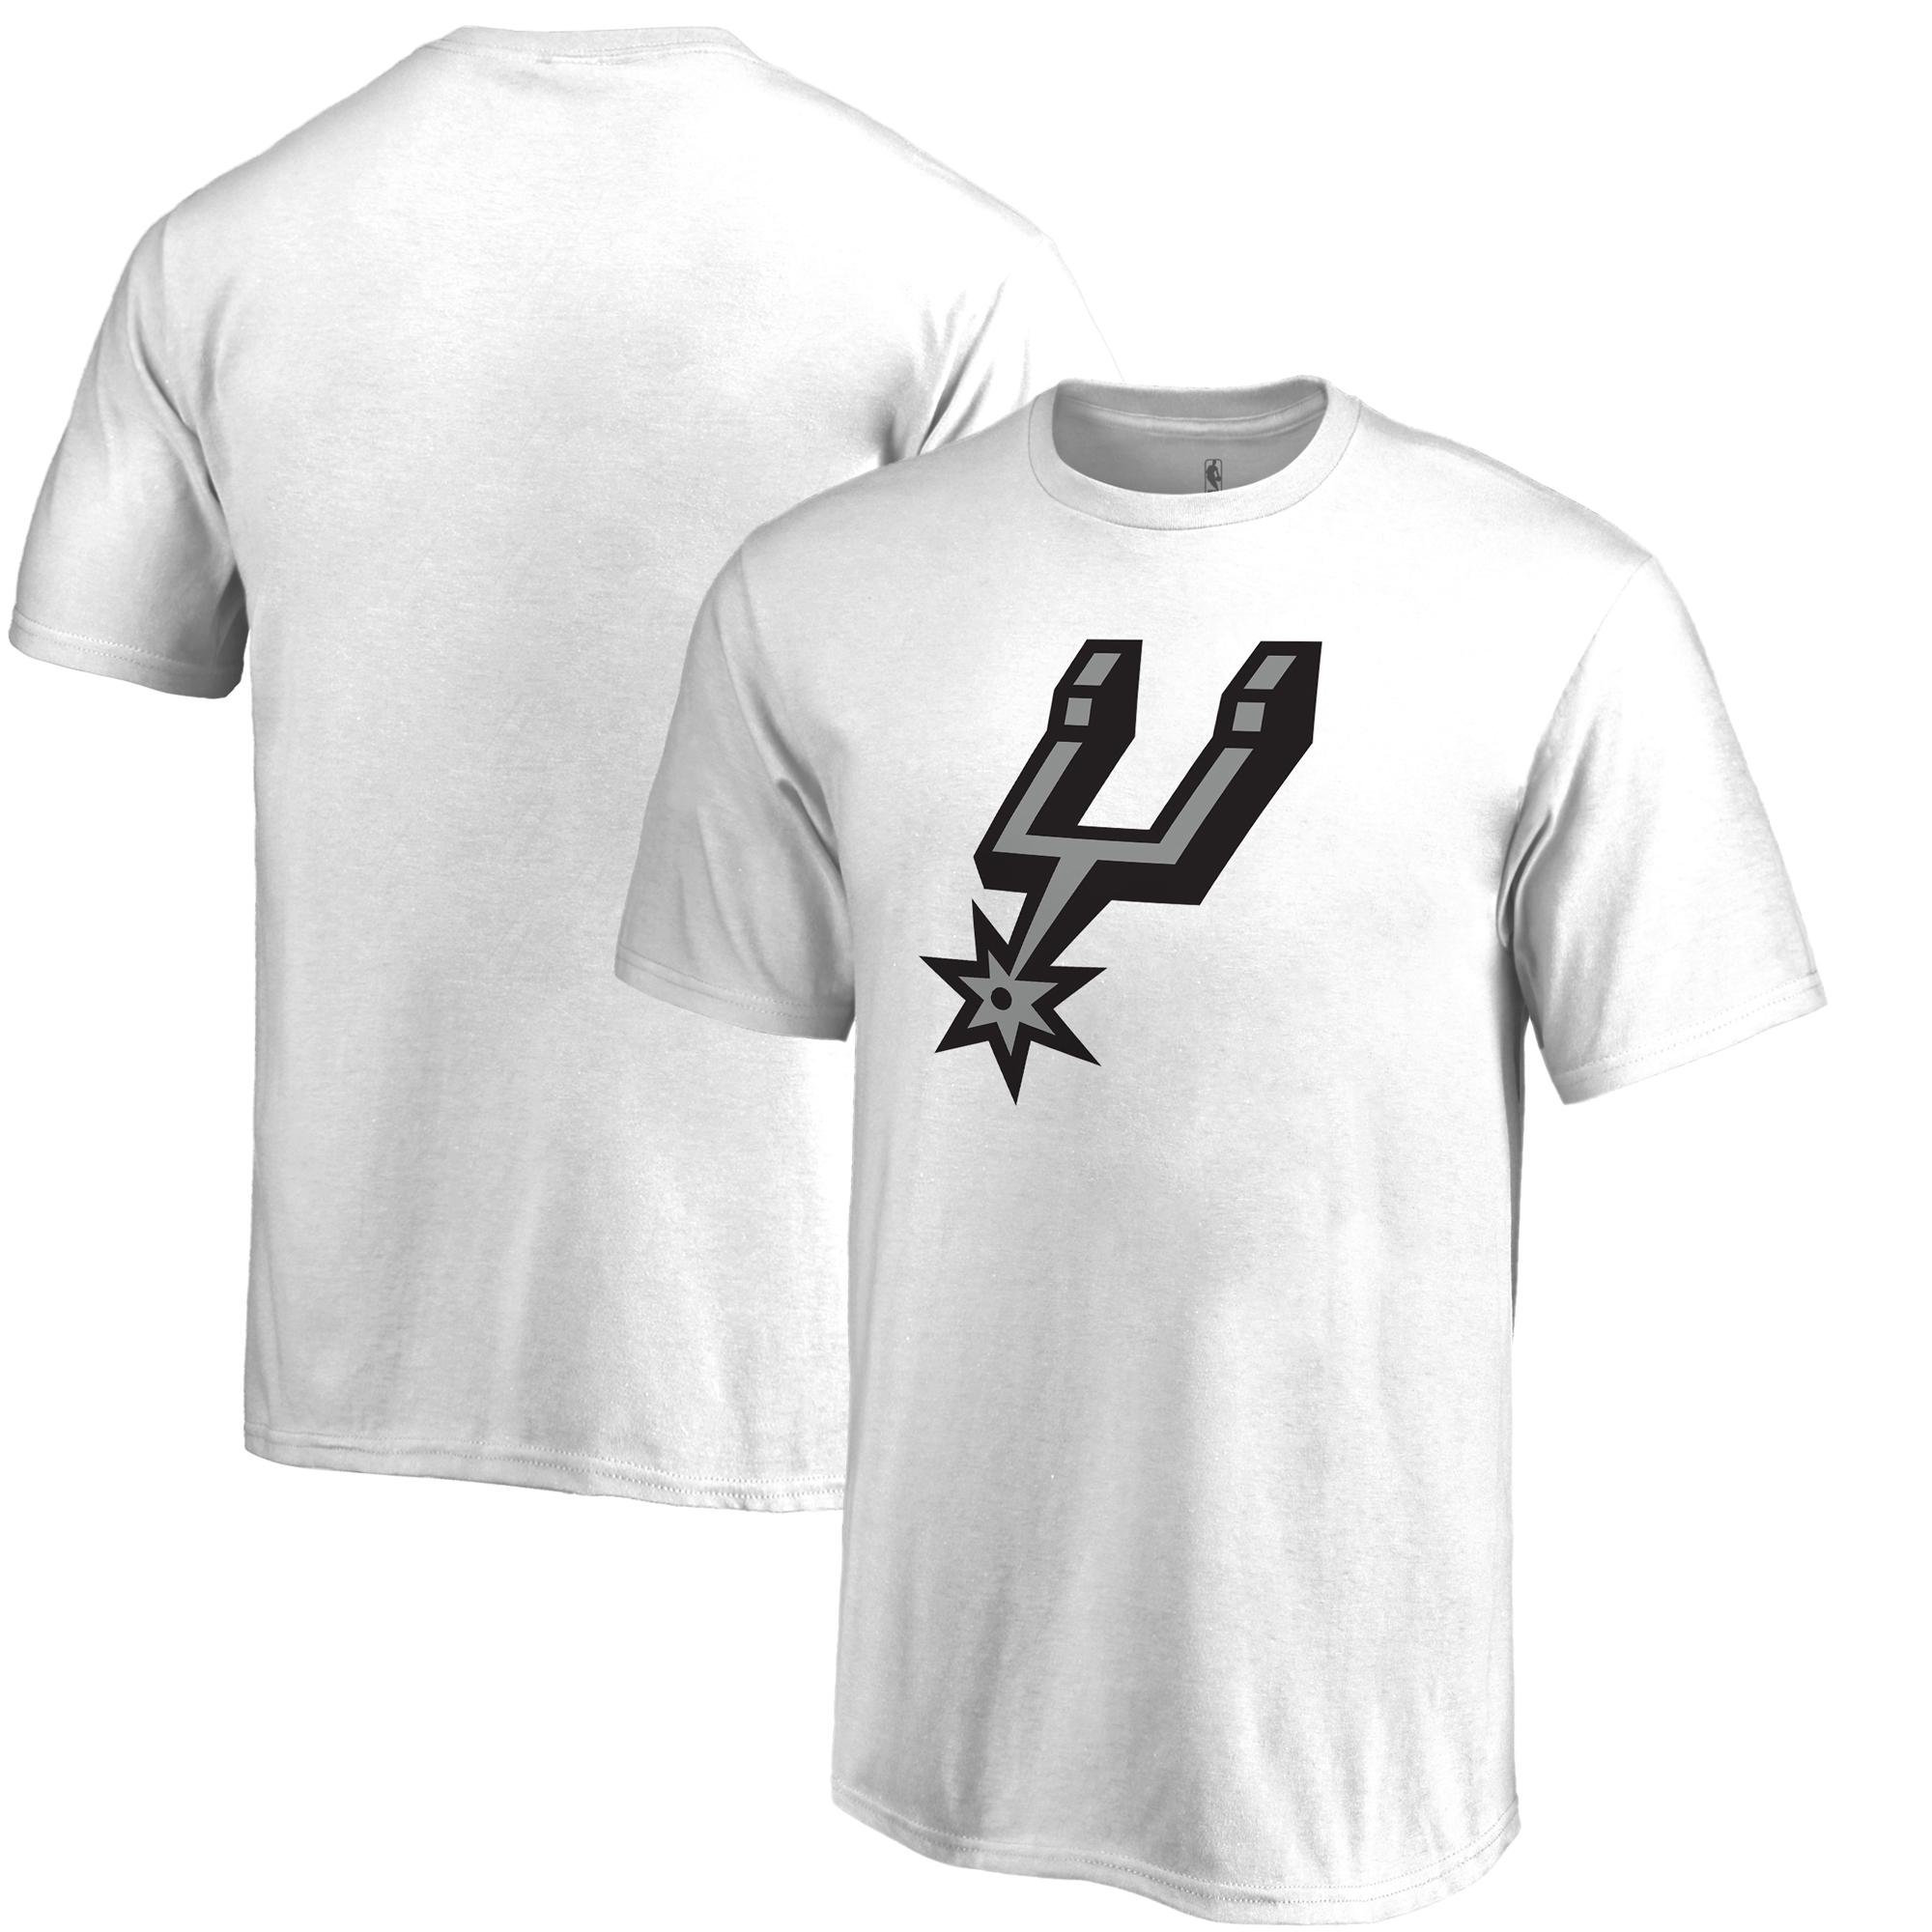 San Antonio Spurs Fanatics Branded Youth Team Primary Logo T-Shirt - White